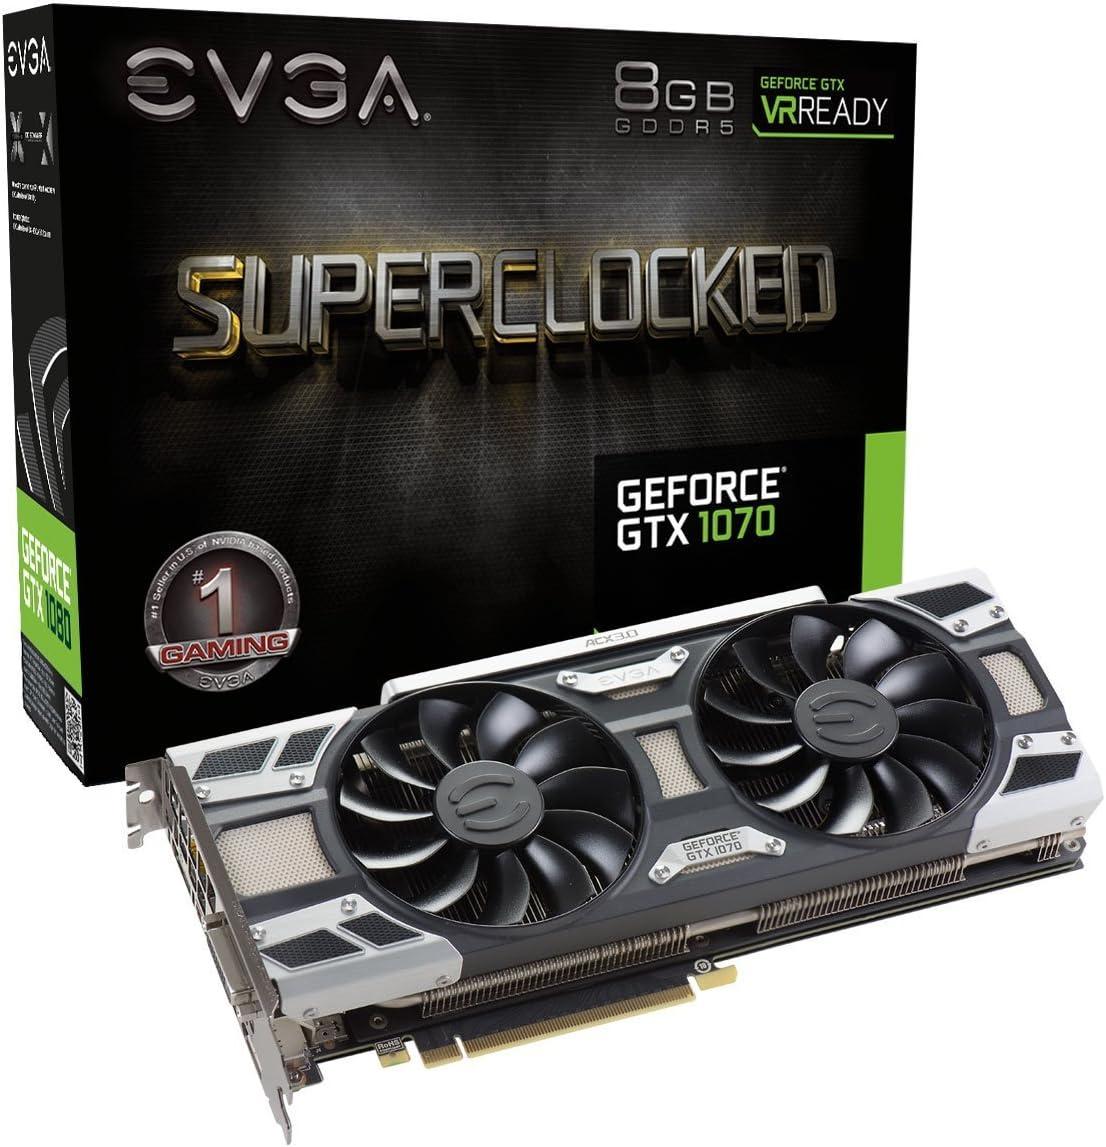 EVGA GeForce GTX 1070 SC GAMING ACX 3.0, 8GB GDDR5, LED, DX12 OSD Support (PXOC) Graphics Card 08G-P4-6173-KR (Renewed)